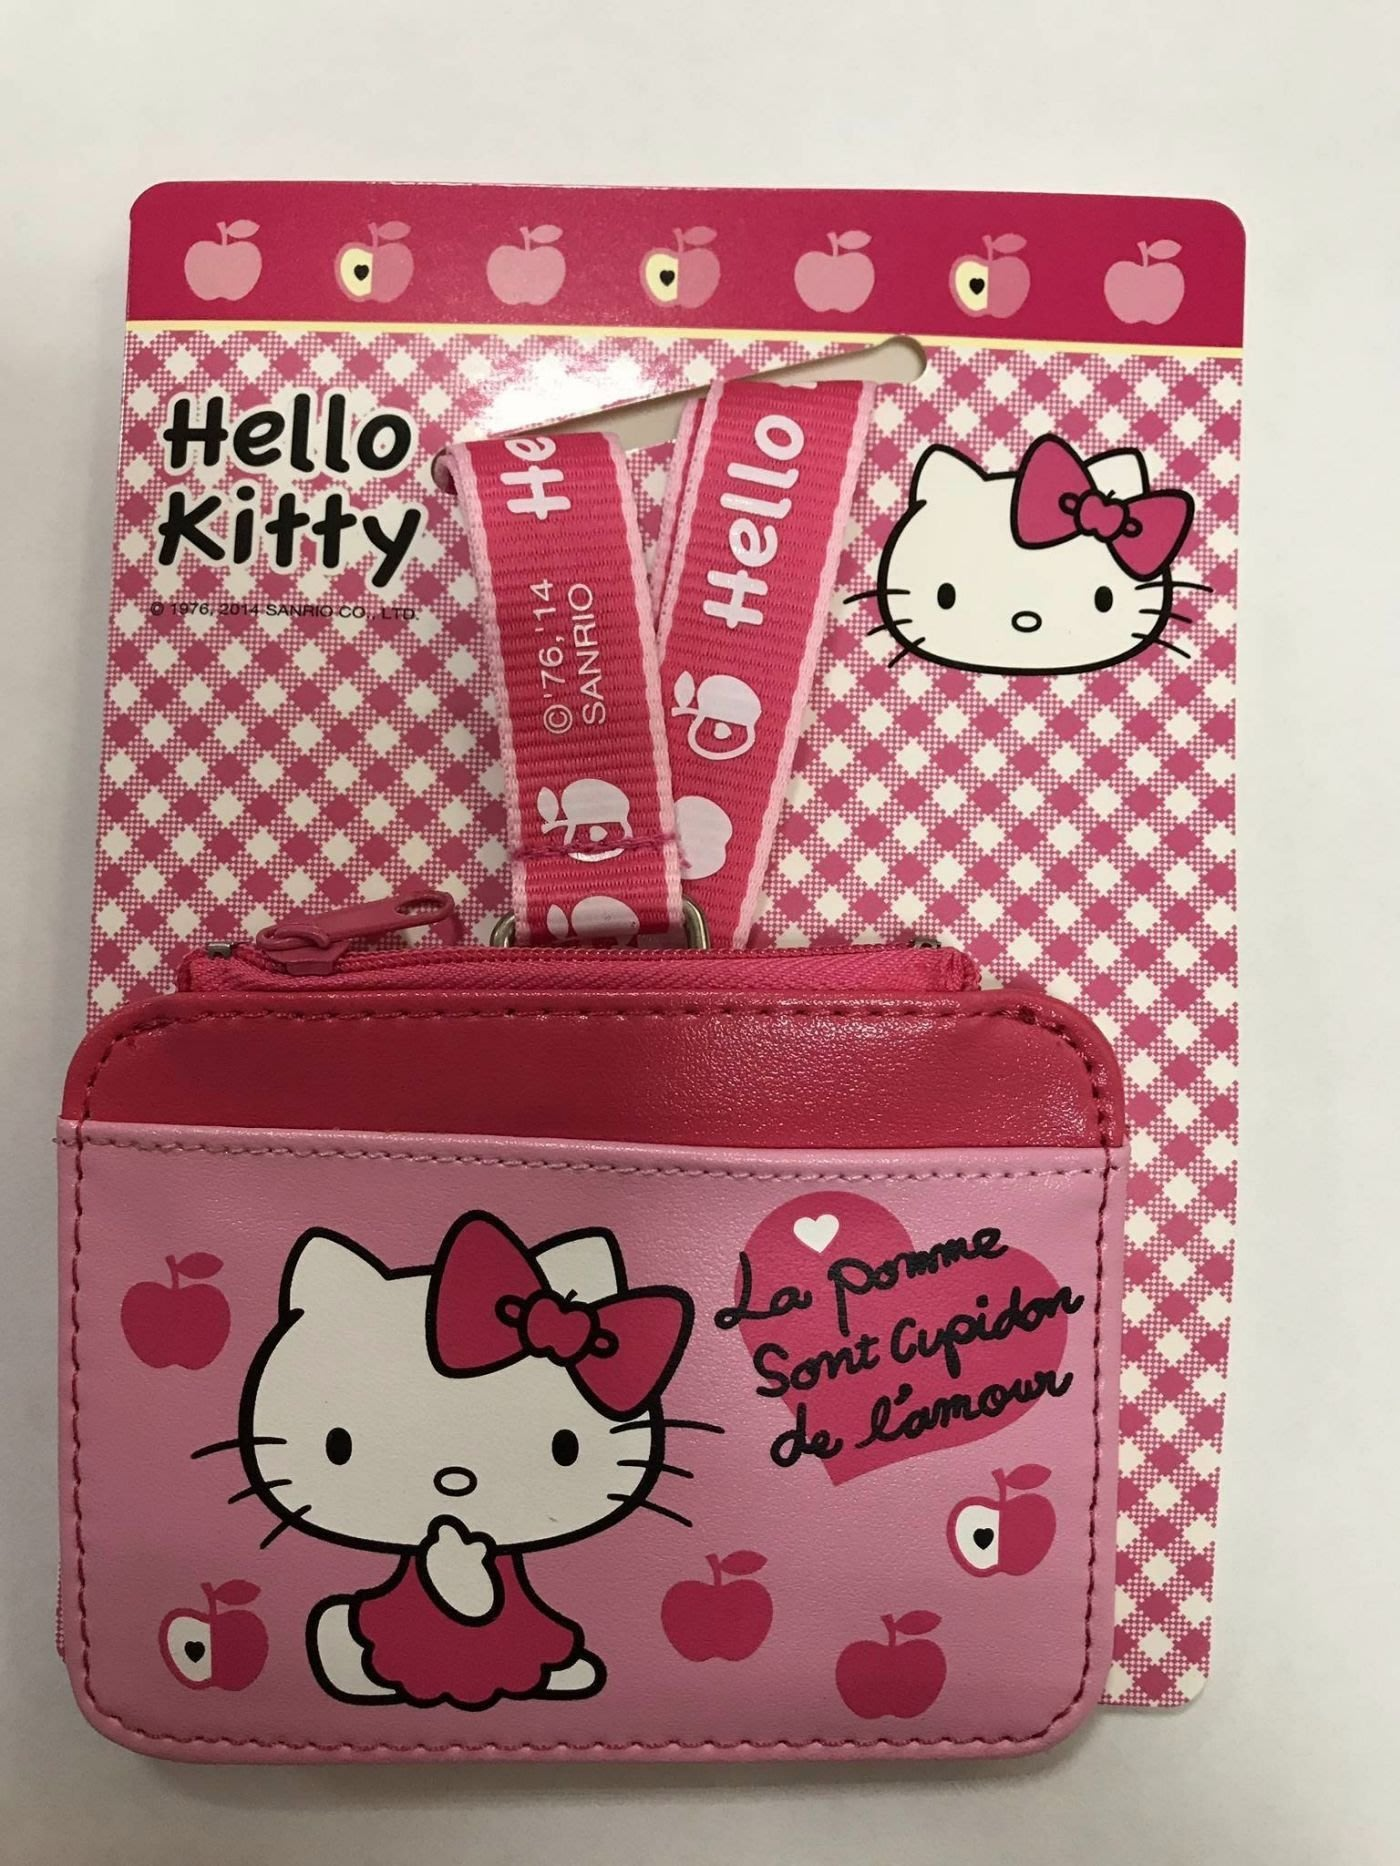 Hello Kitty KT二代證件套連頸繩4713791962834